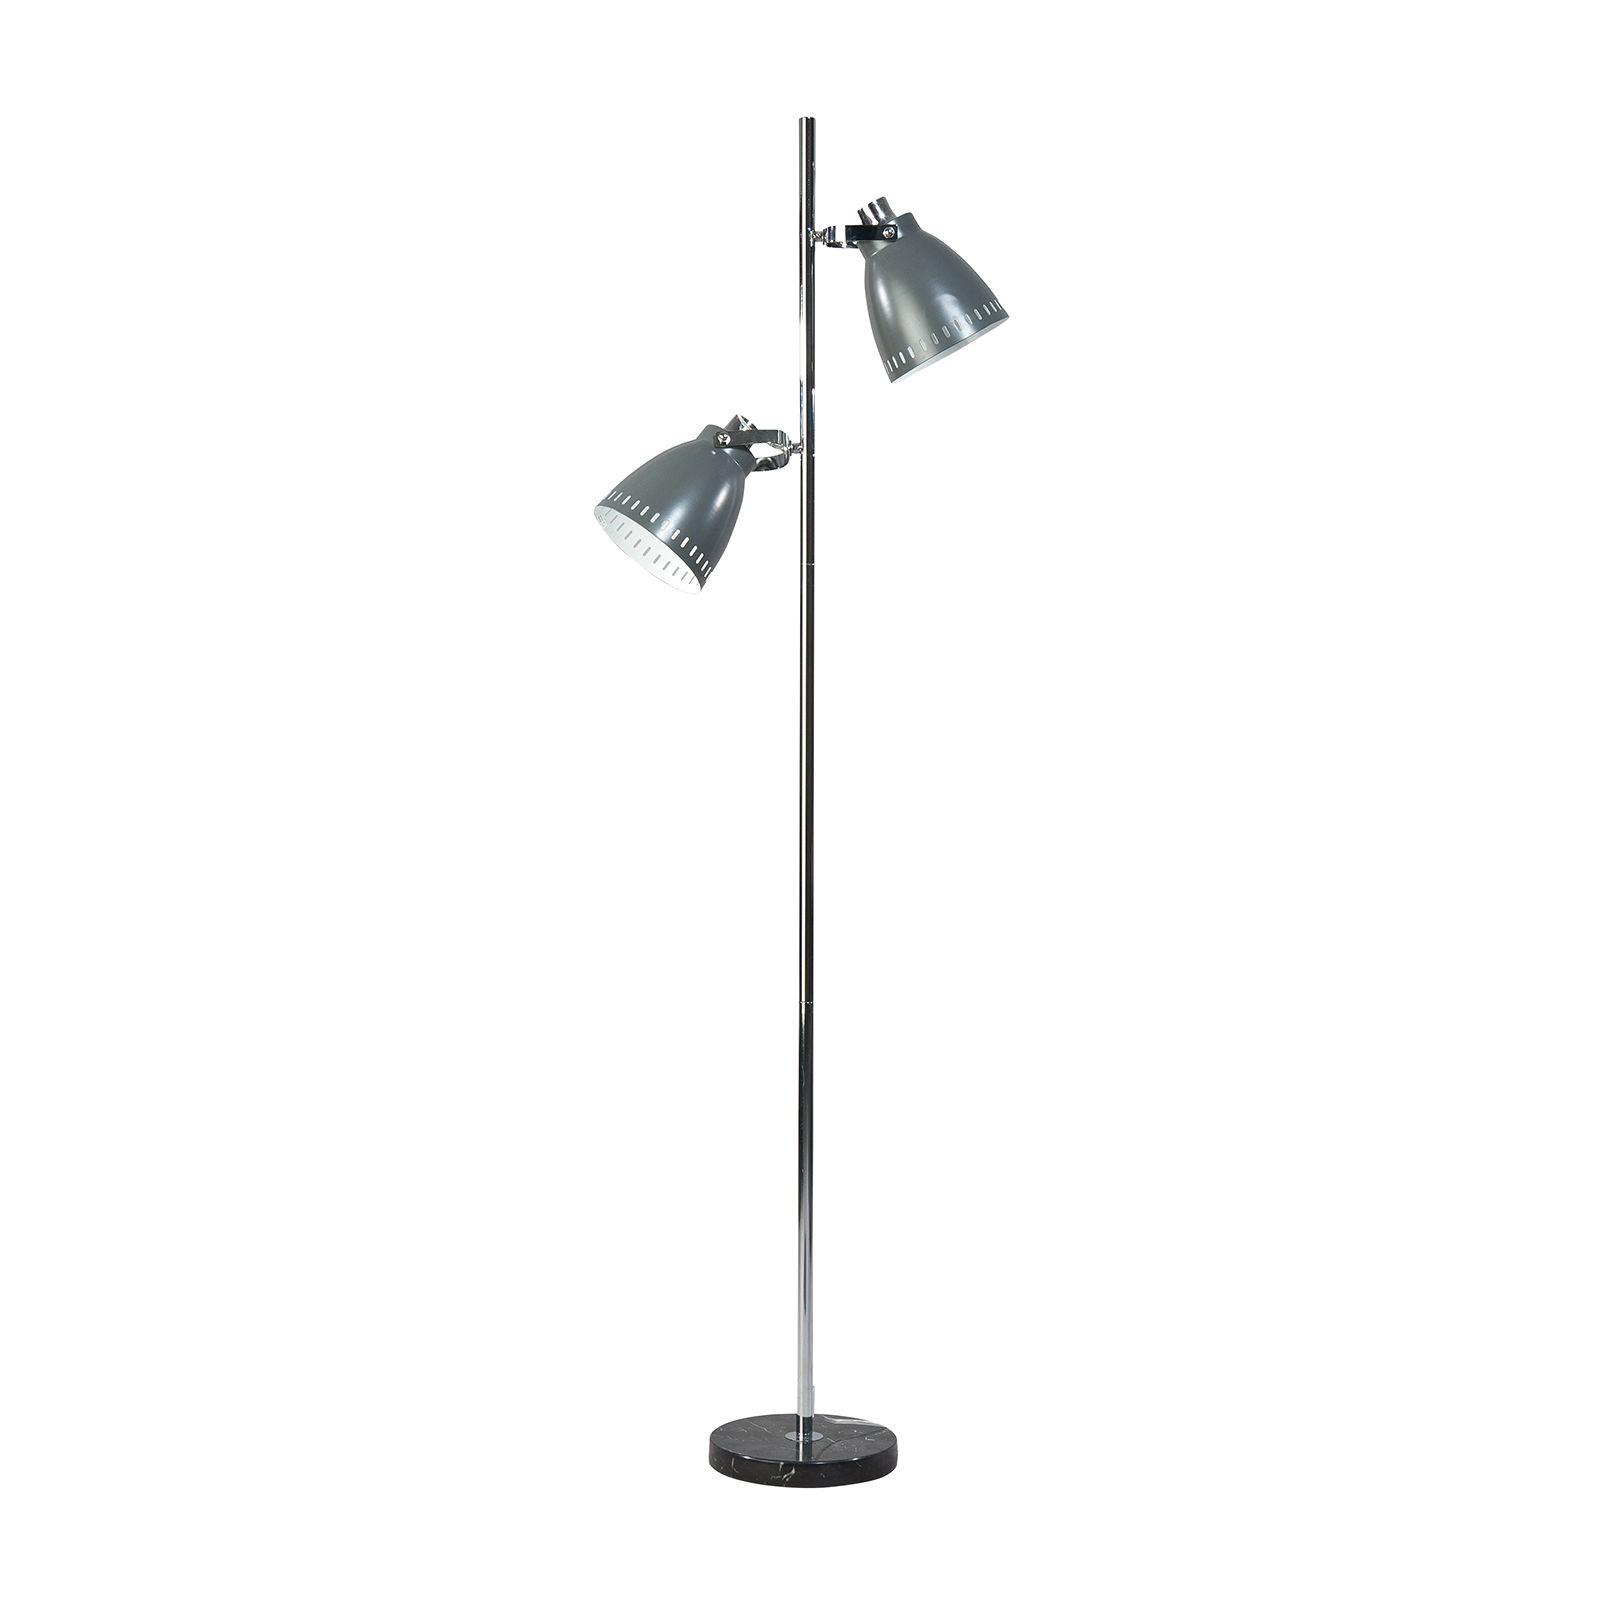 Acate vloerlamp ETH 2x grijs/chroom